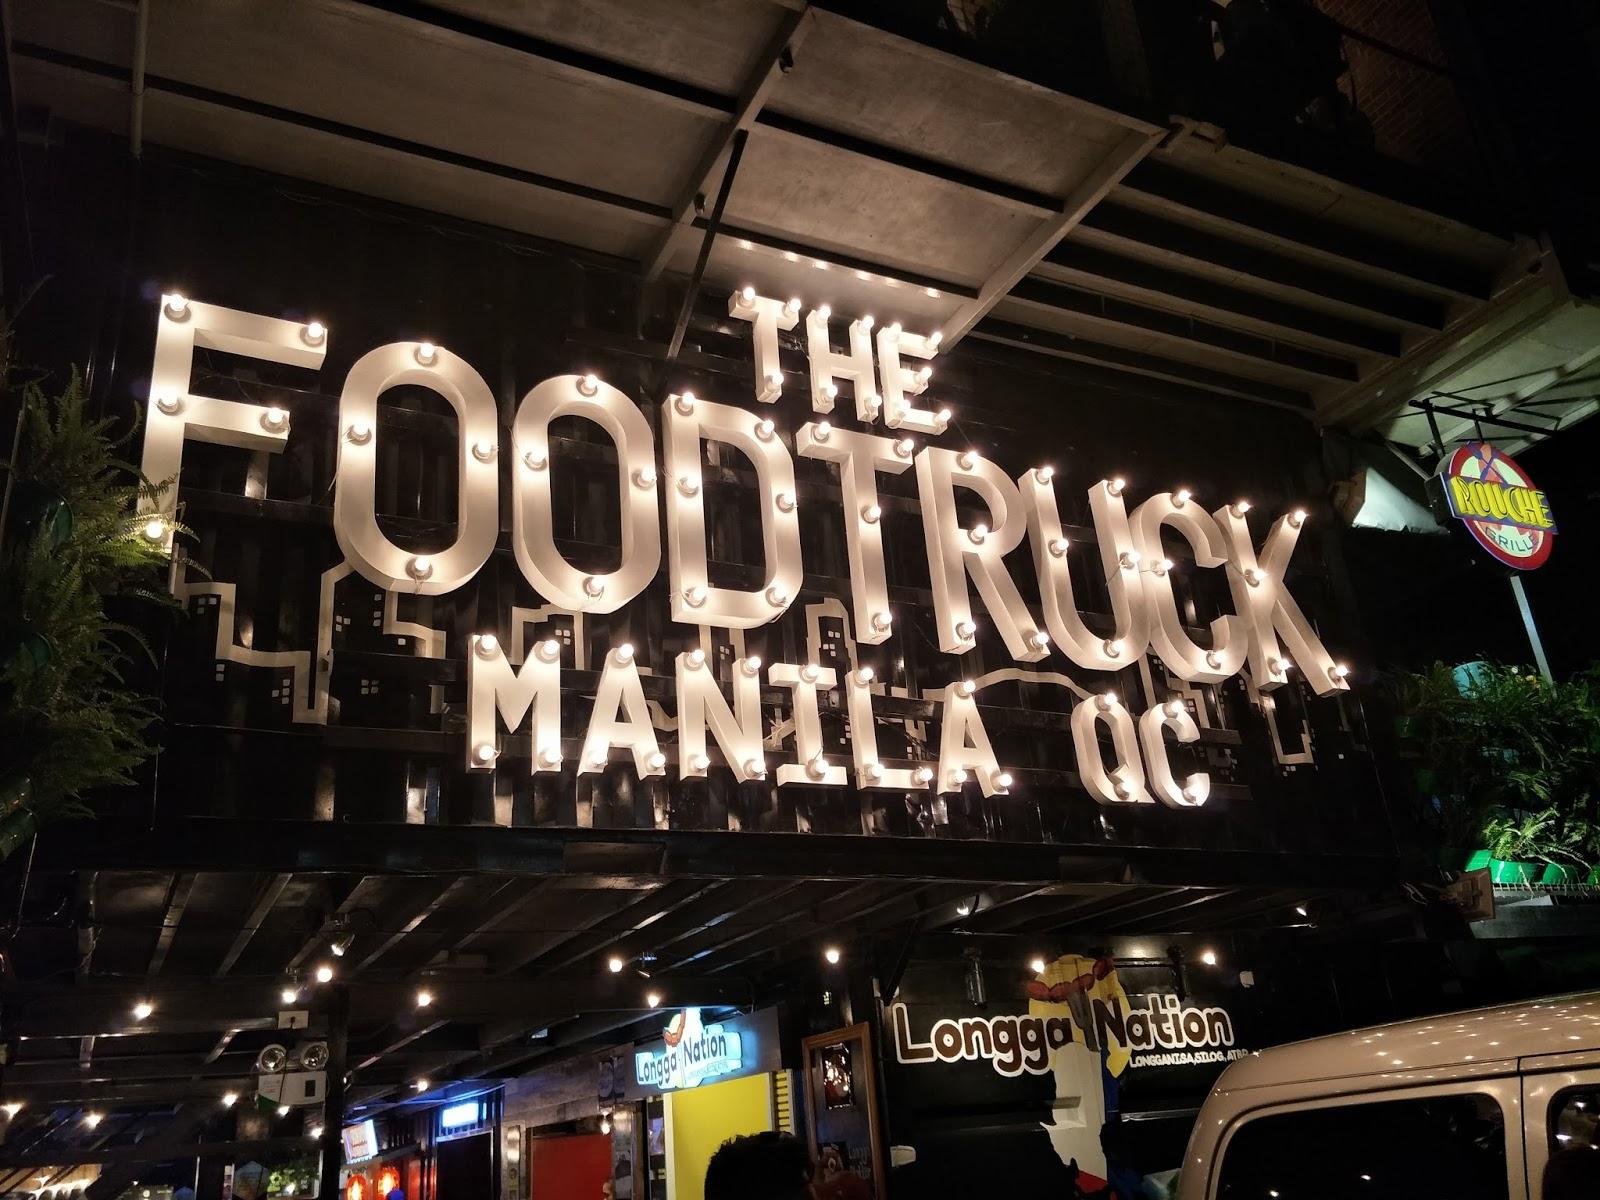 Adventures of a diva princess the food truck manila qc